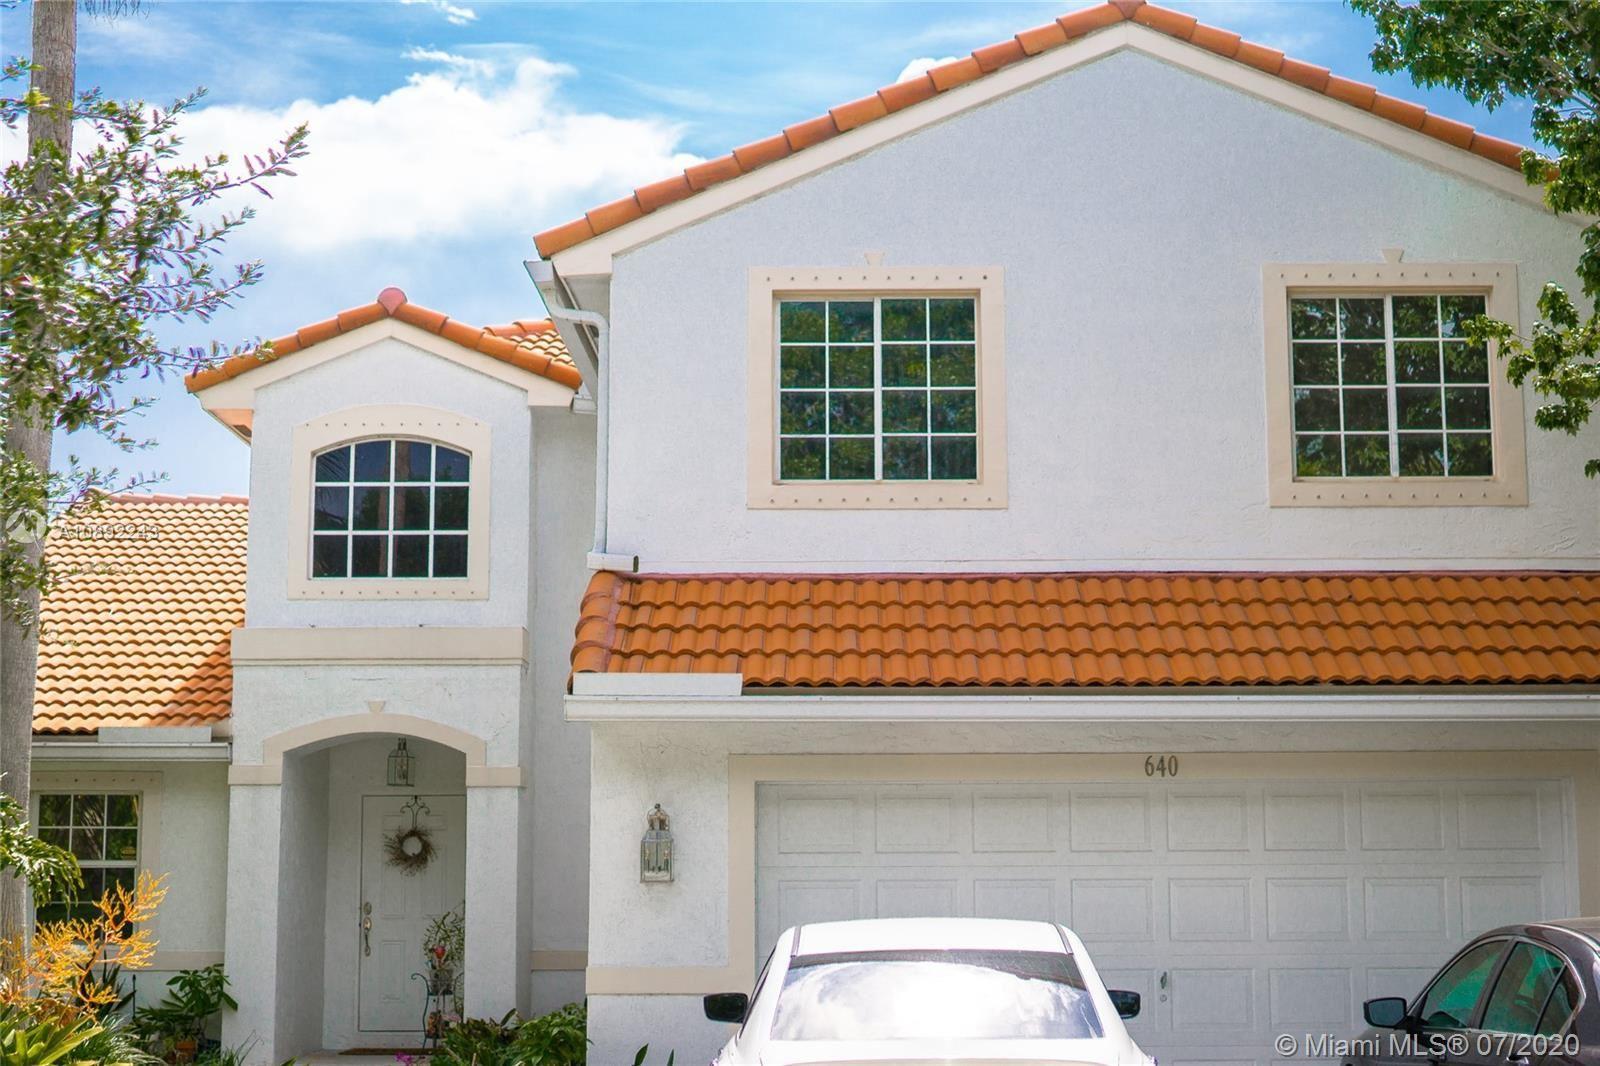 640 SW 164th Ave, Pembroke Pines, FL 33027 - #: A10892243